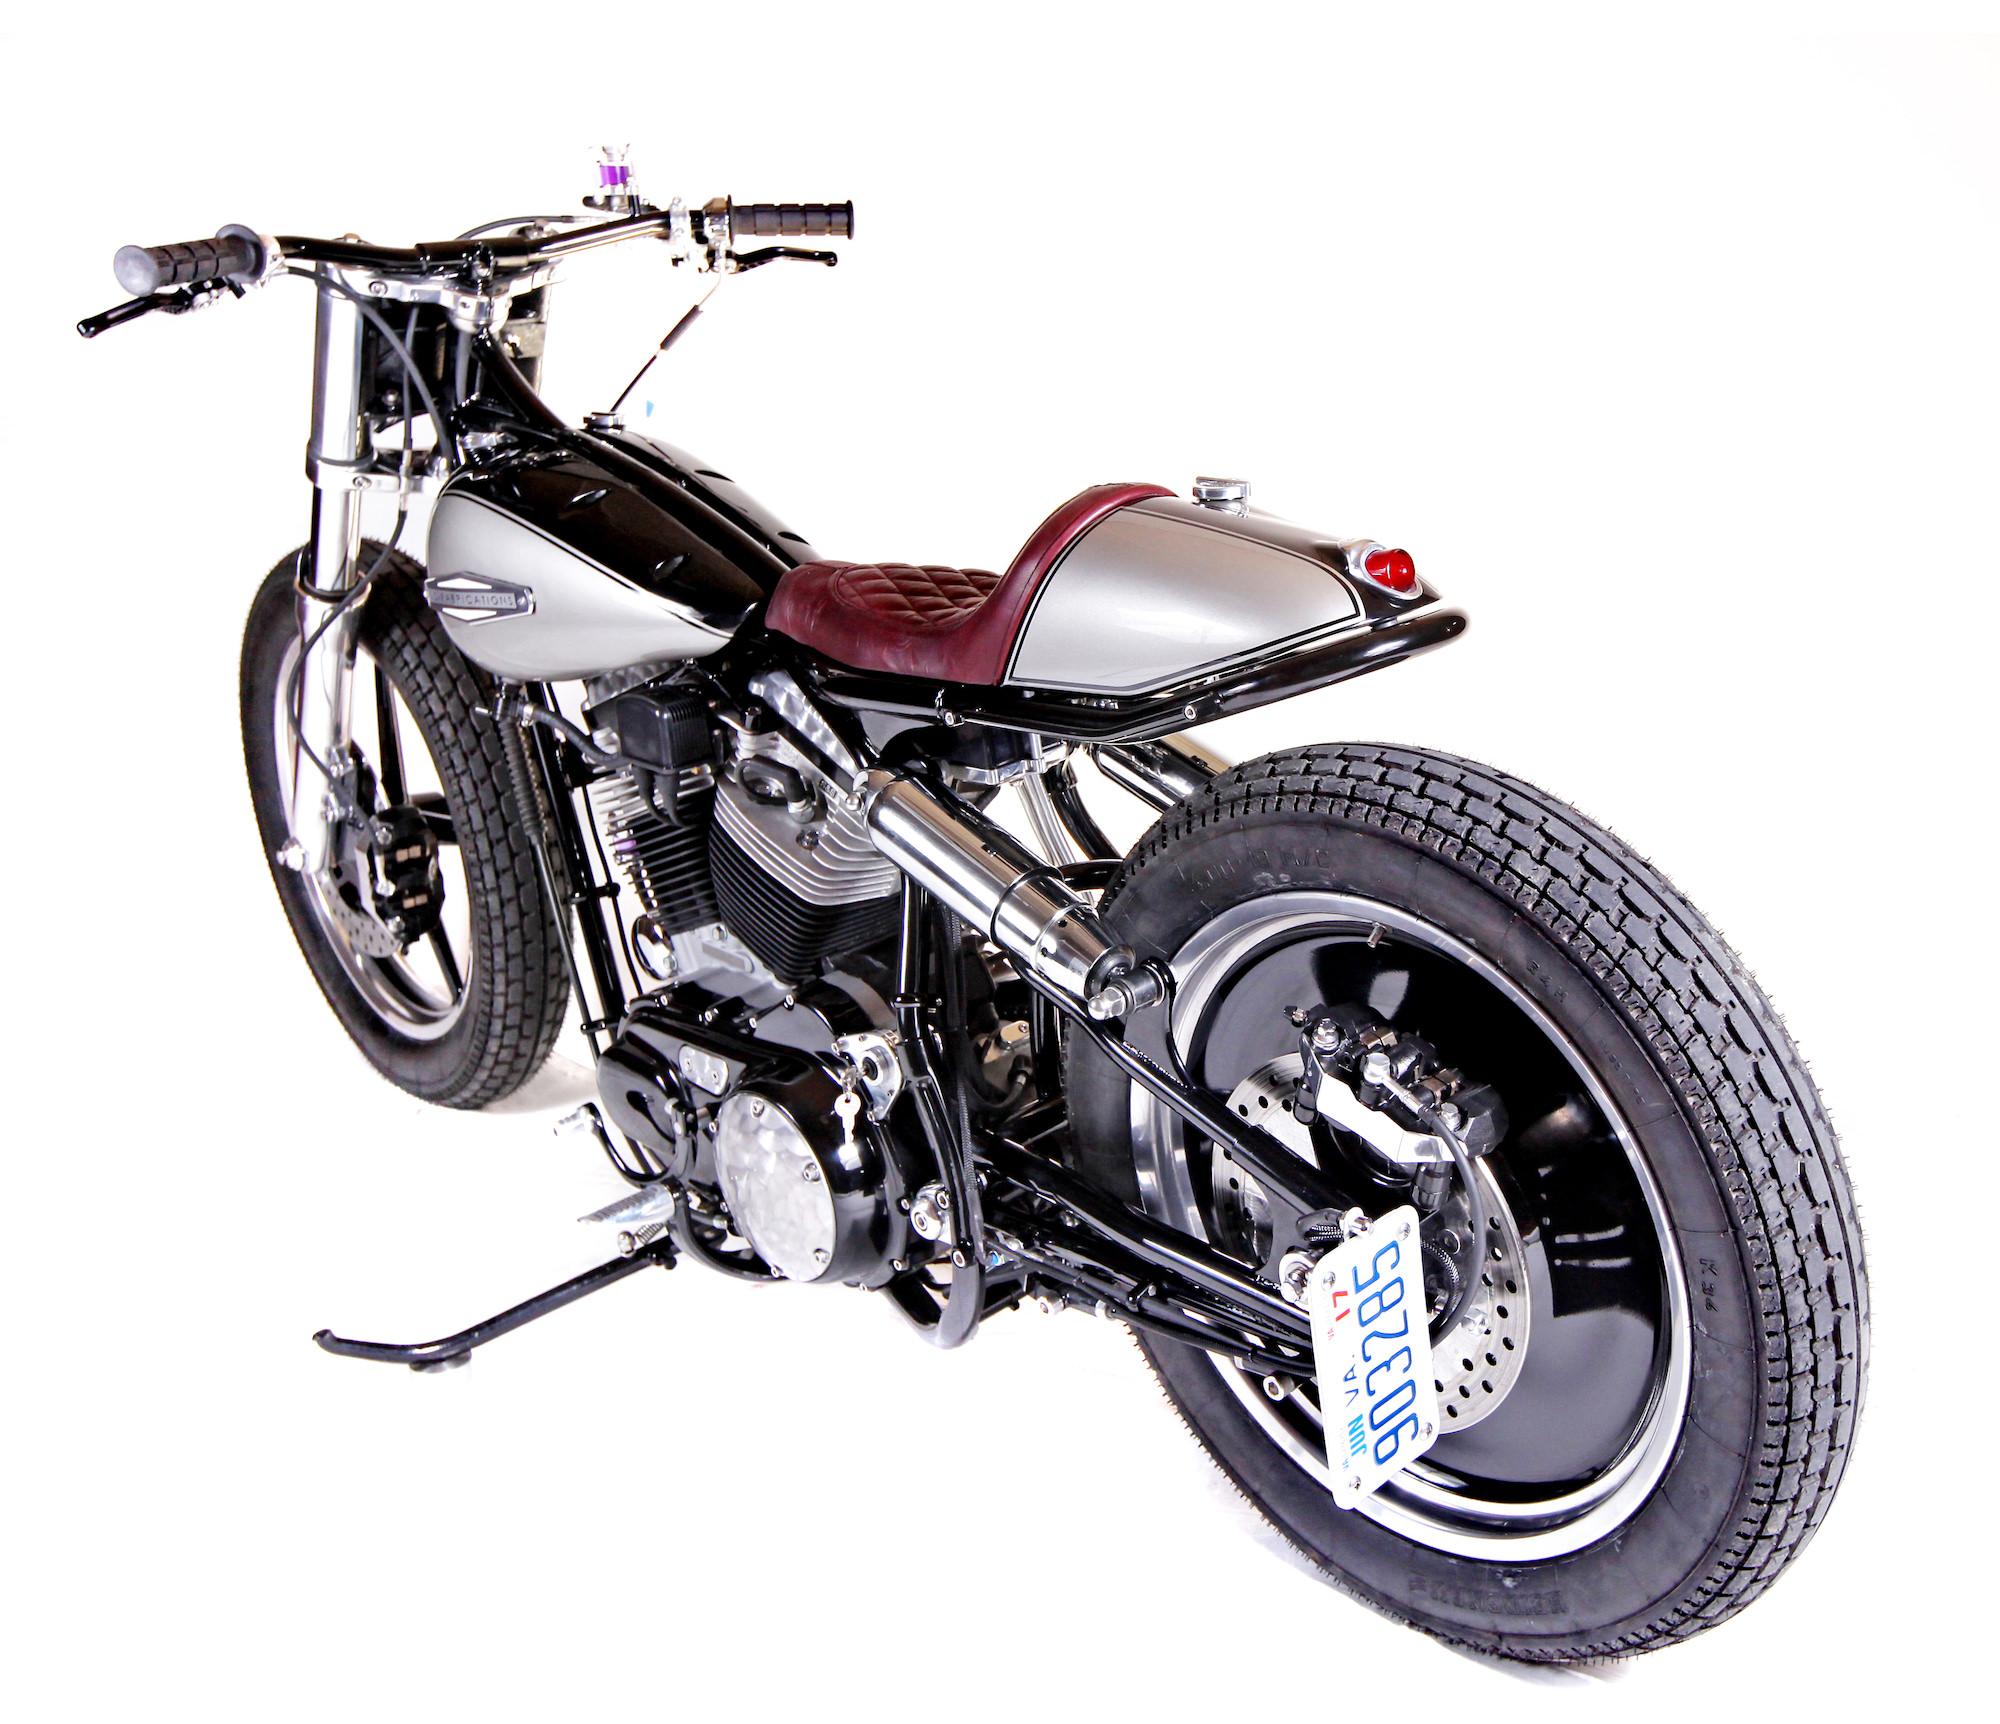 LC Fabrications Harley-Davidson Sportster